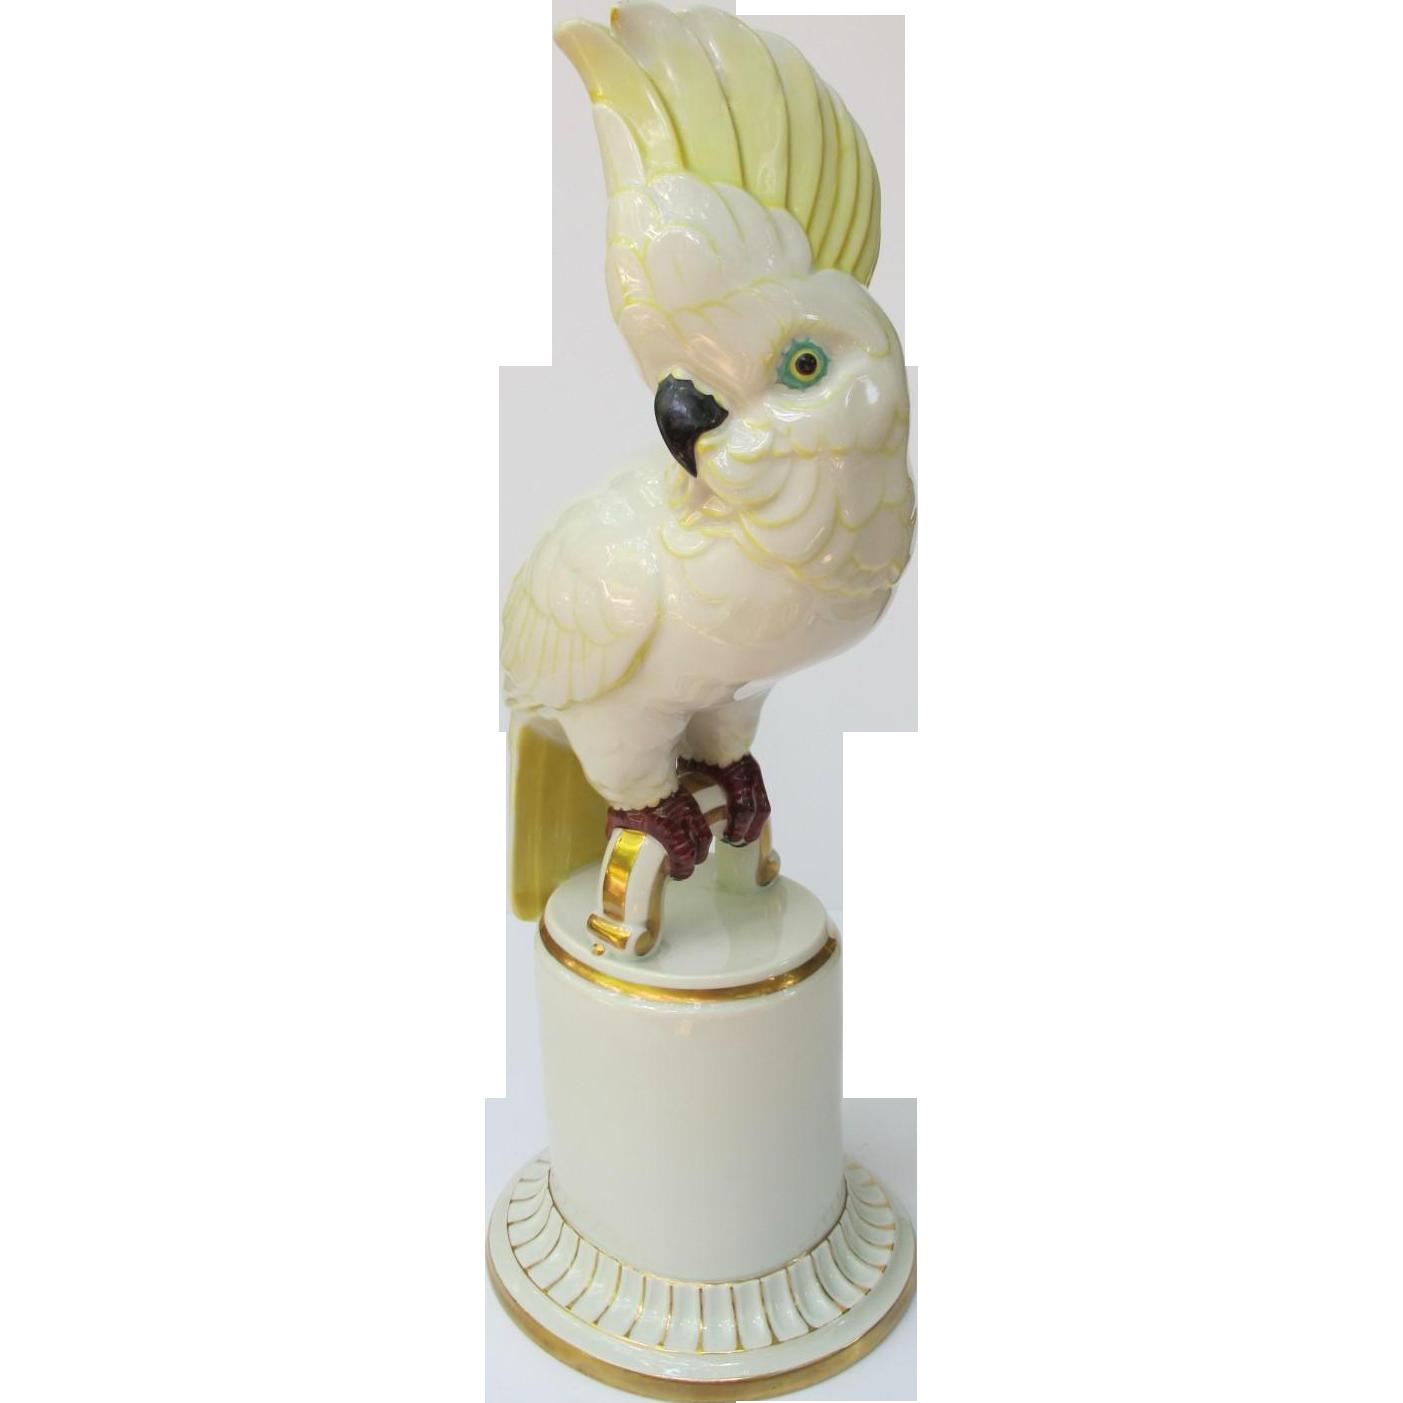 Vintage Art Deco Hutschenreuther Cockatoo Figurine Large